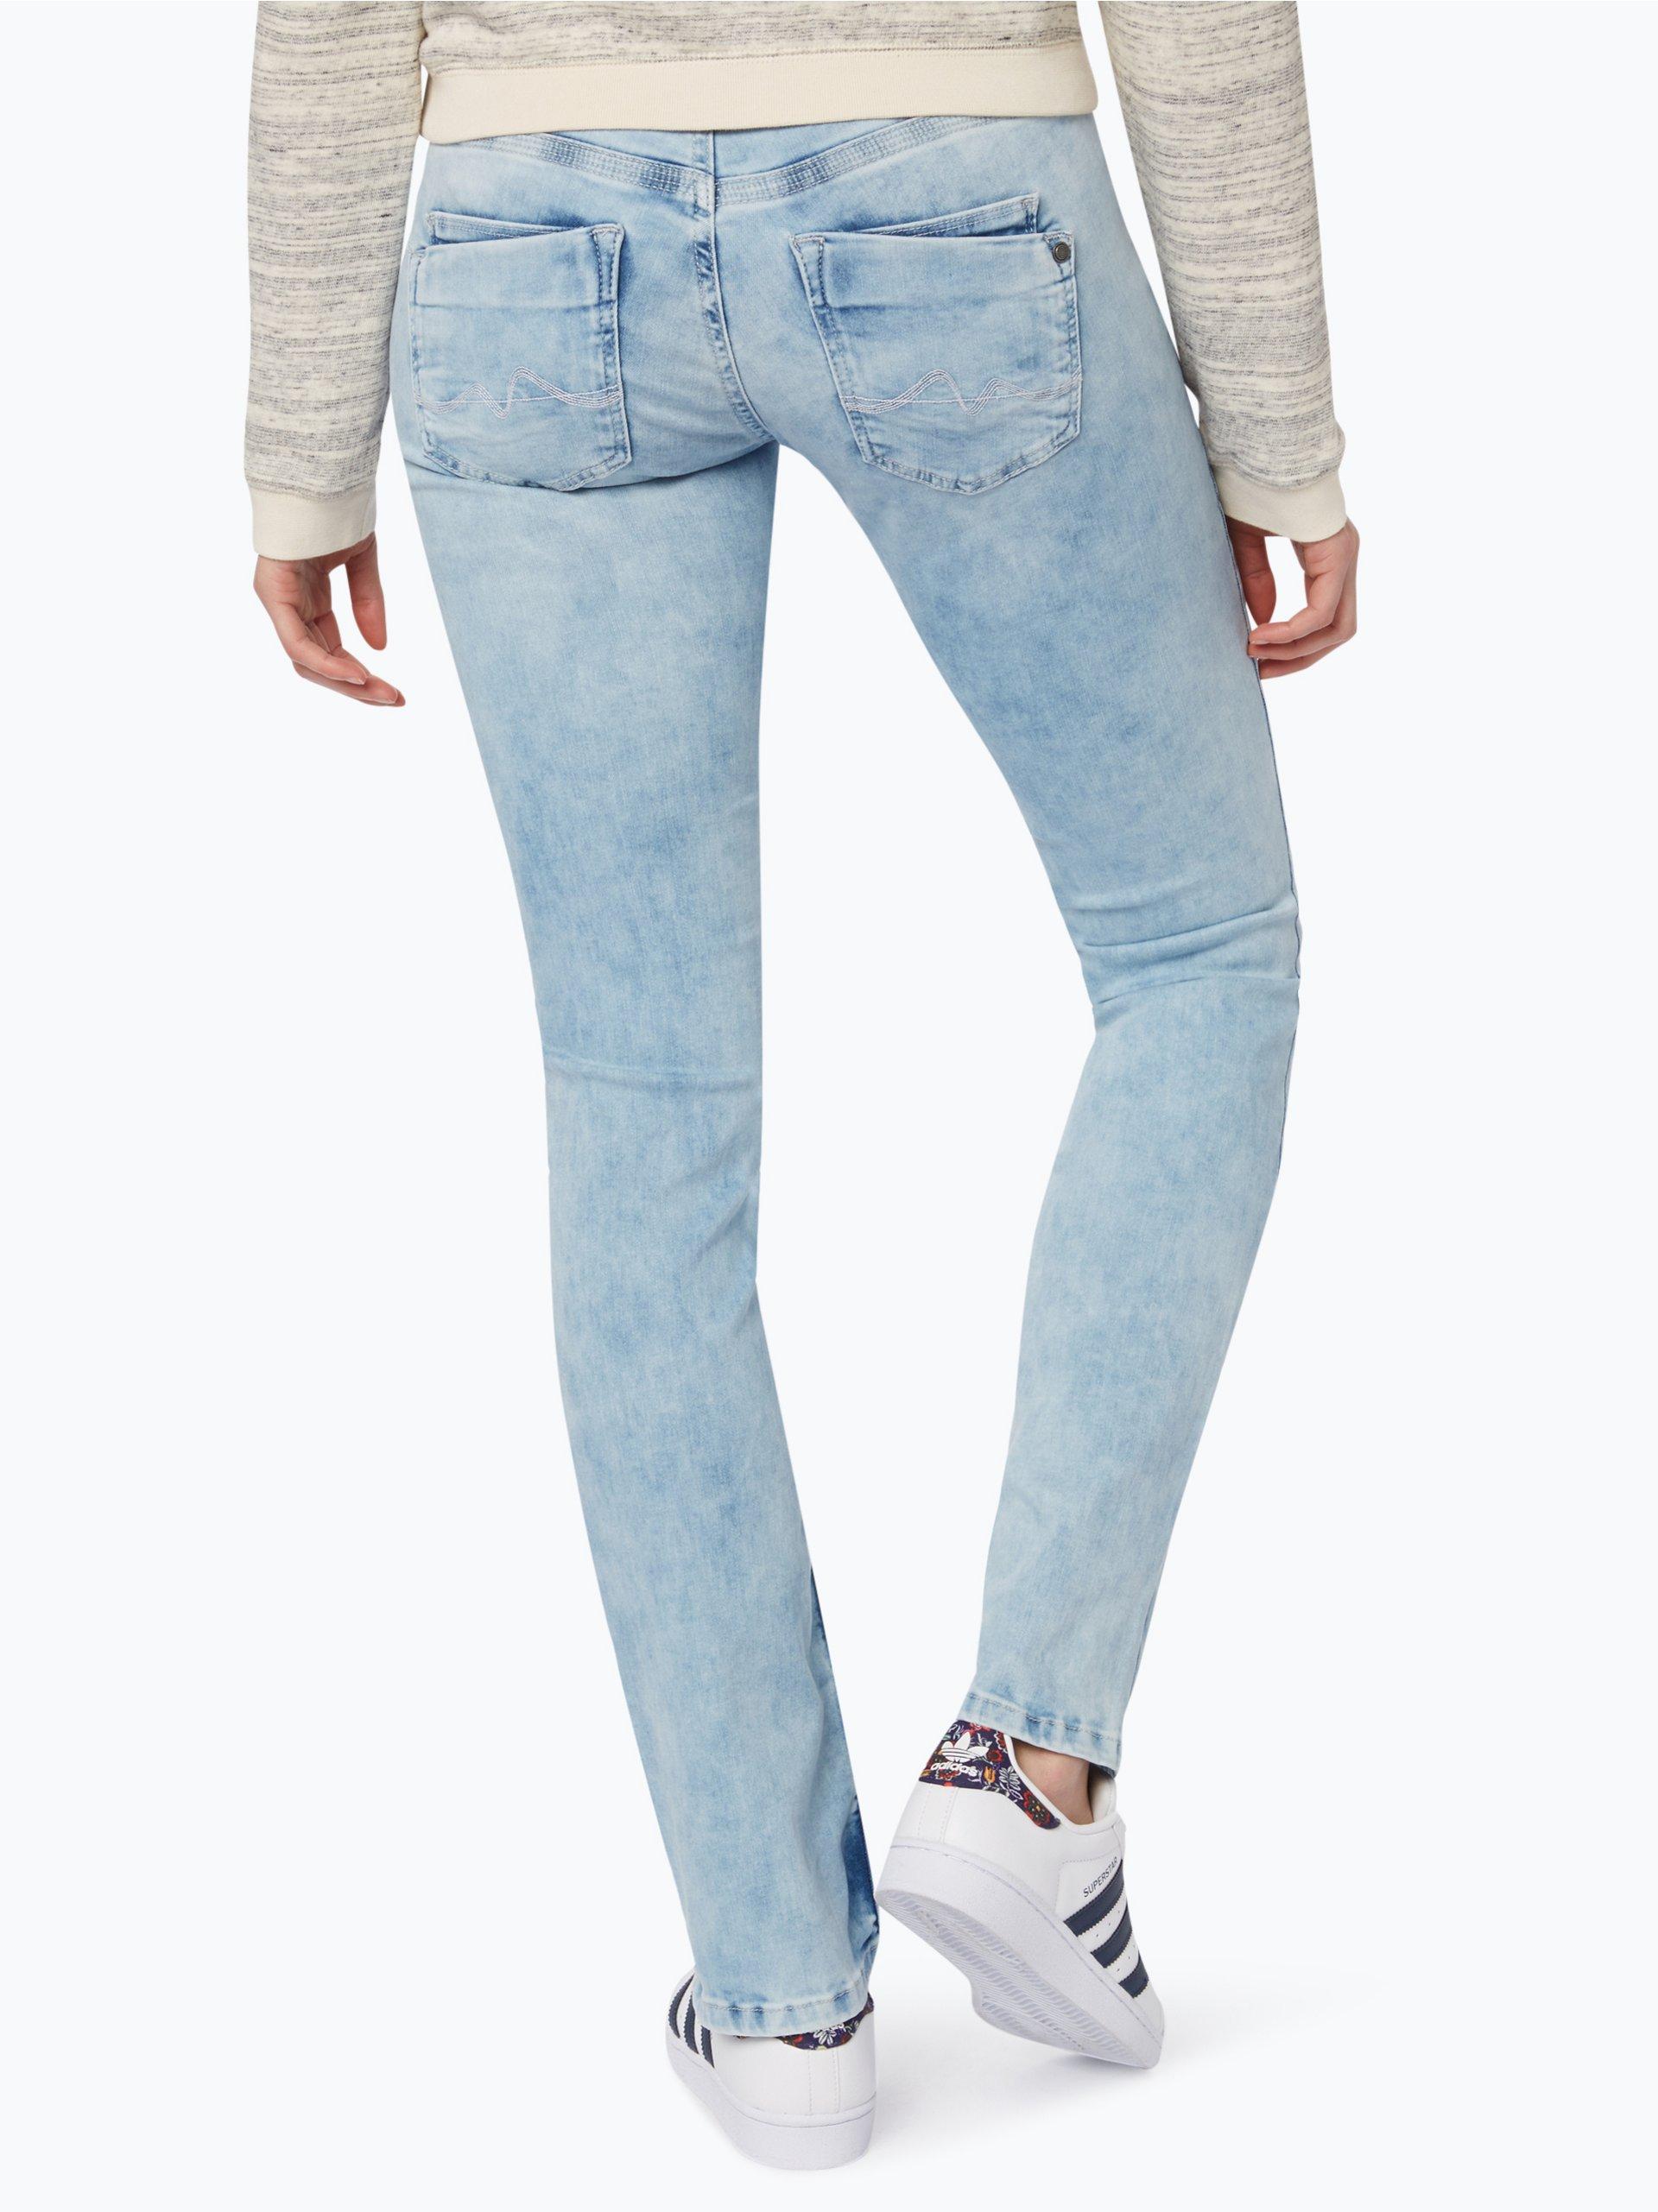 pepe jeans damen jeans saturn hellblau blau uni online kaufen vangraaf com. Black Bedroom Furniture Sets. Home Design Ideas